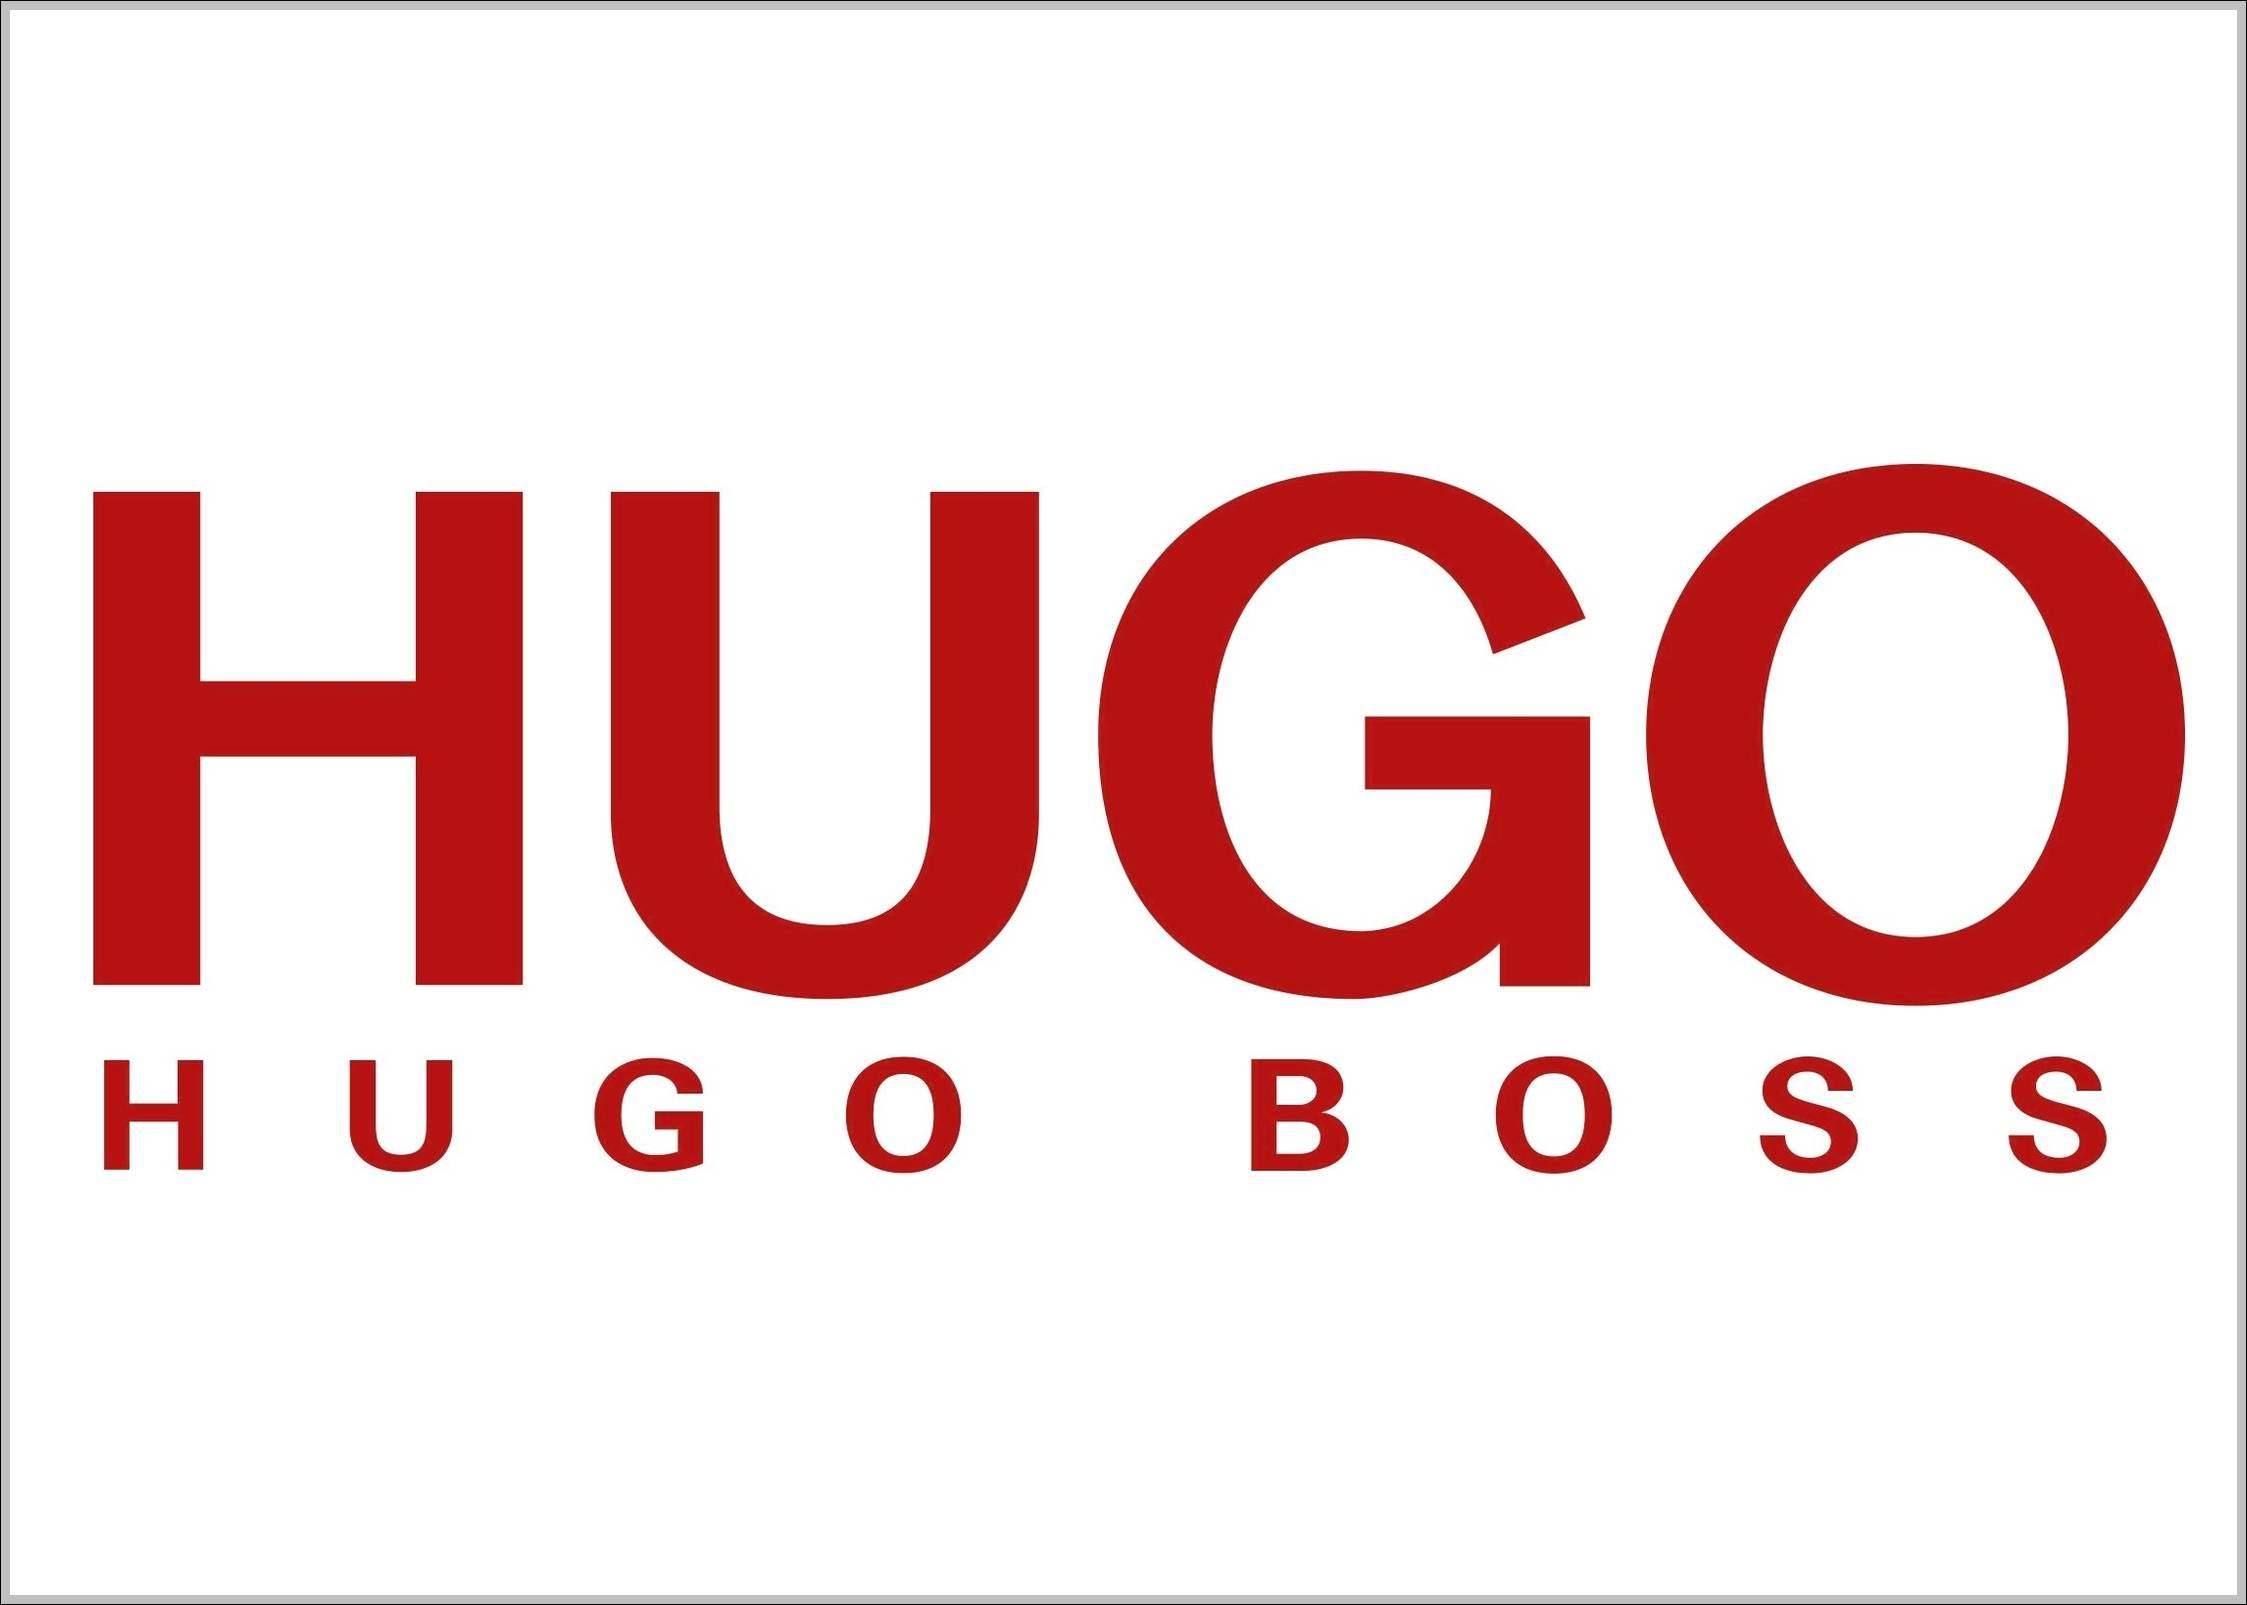 hugo boss logo hugo brand logo sign logos signs symbols trademarks of companies and brands. Black Bedroom Furniture Sets. Home Design Ideas